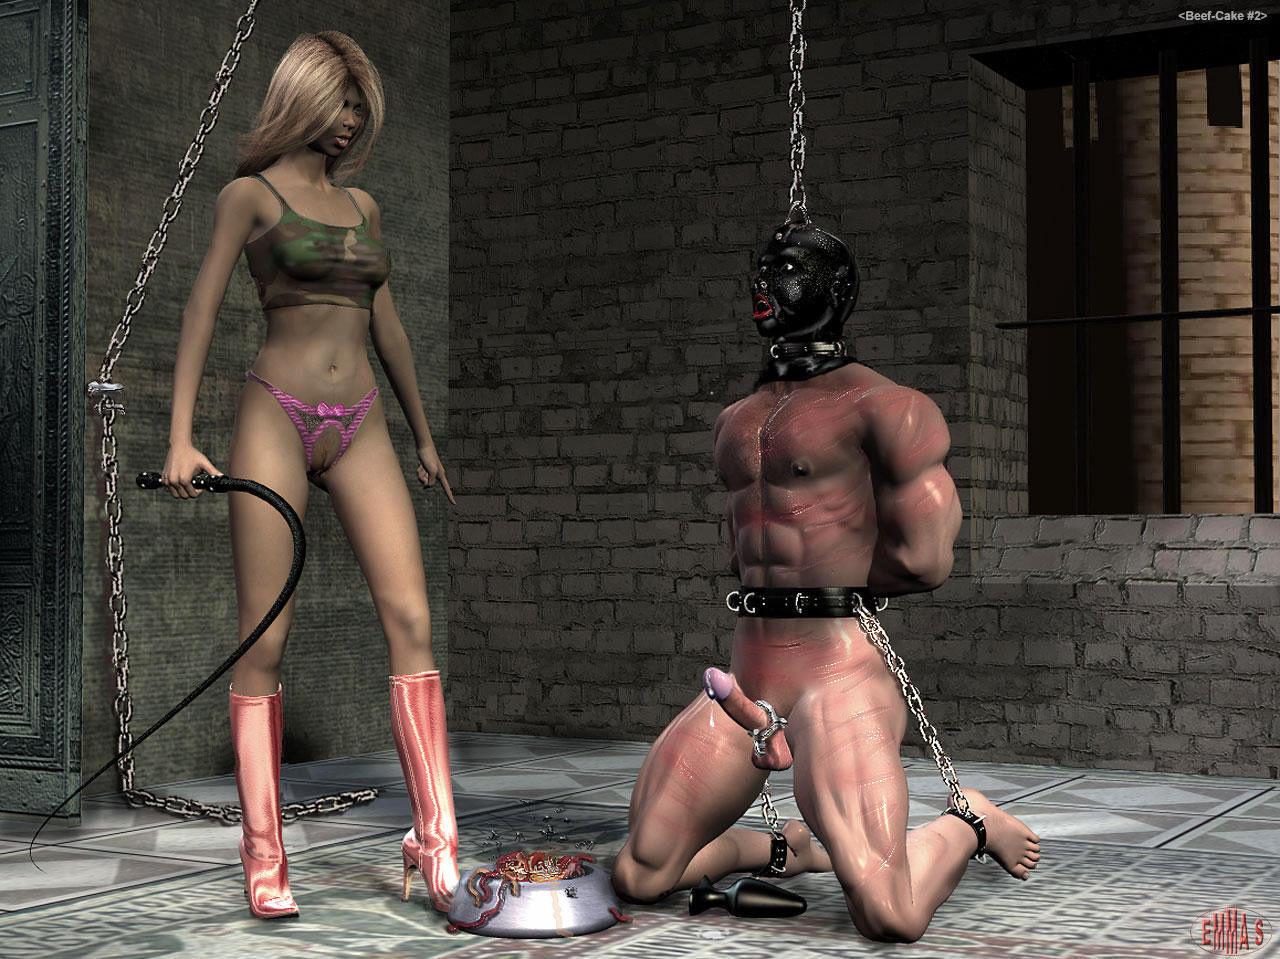 Femdom enslavement stories